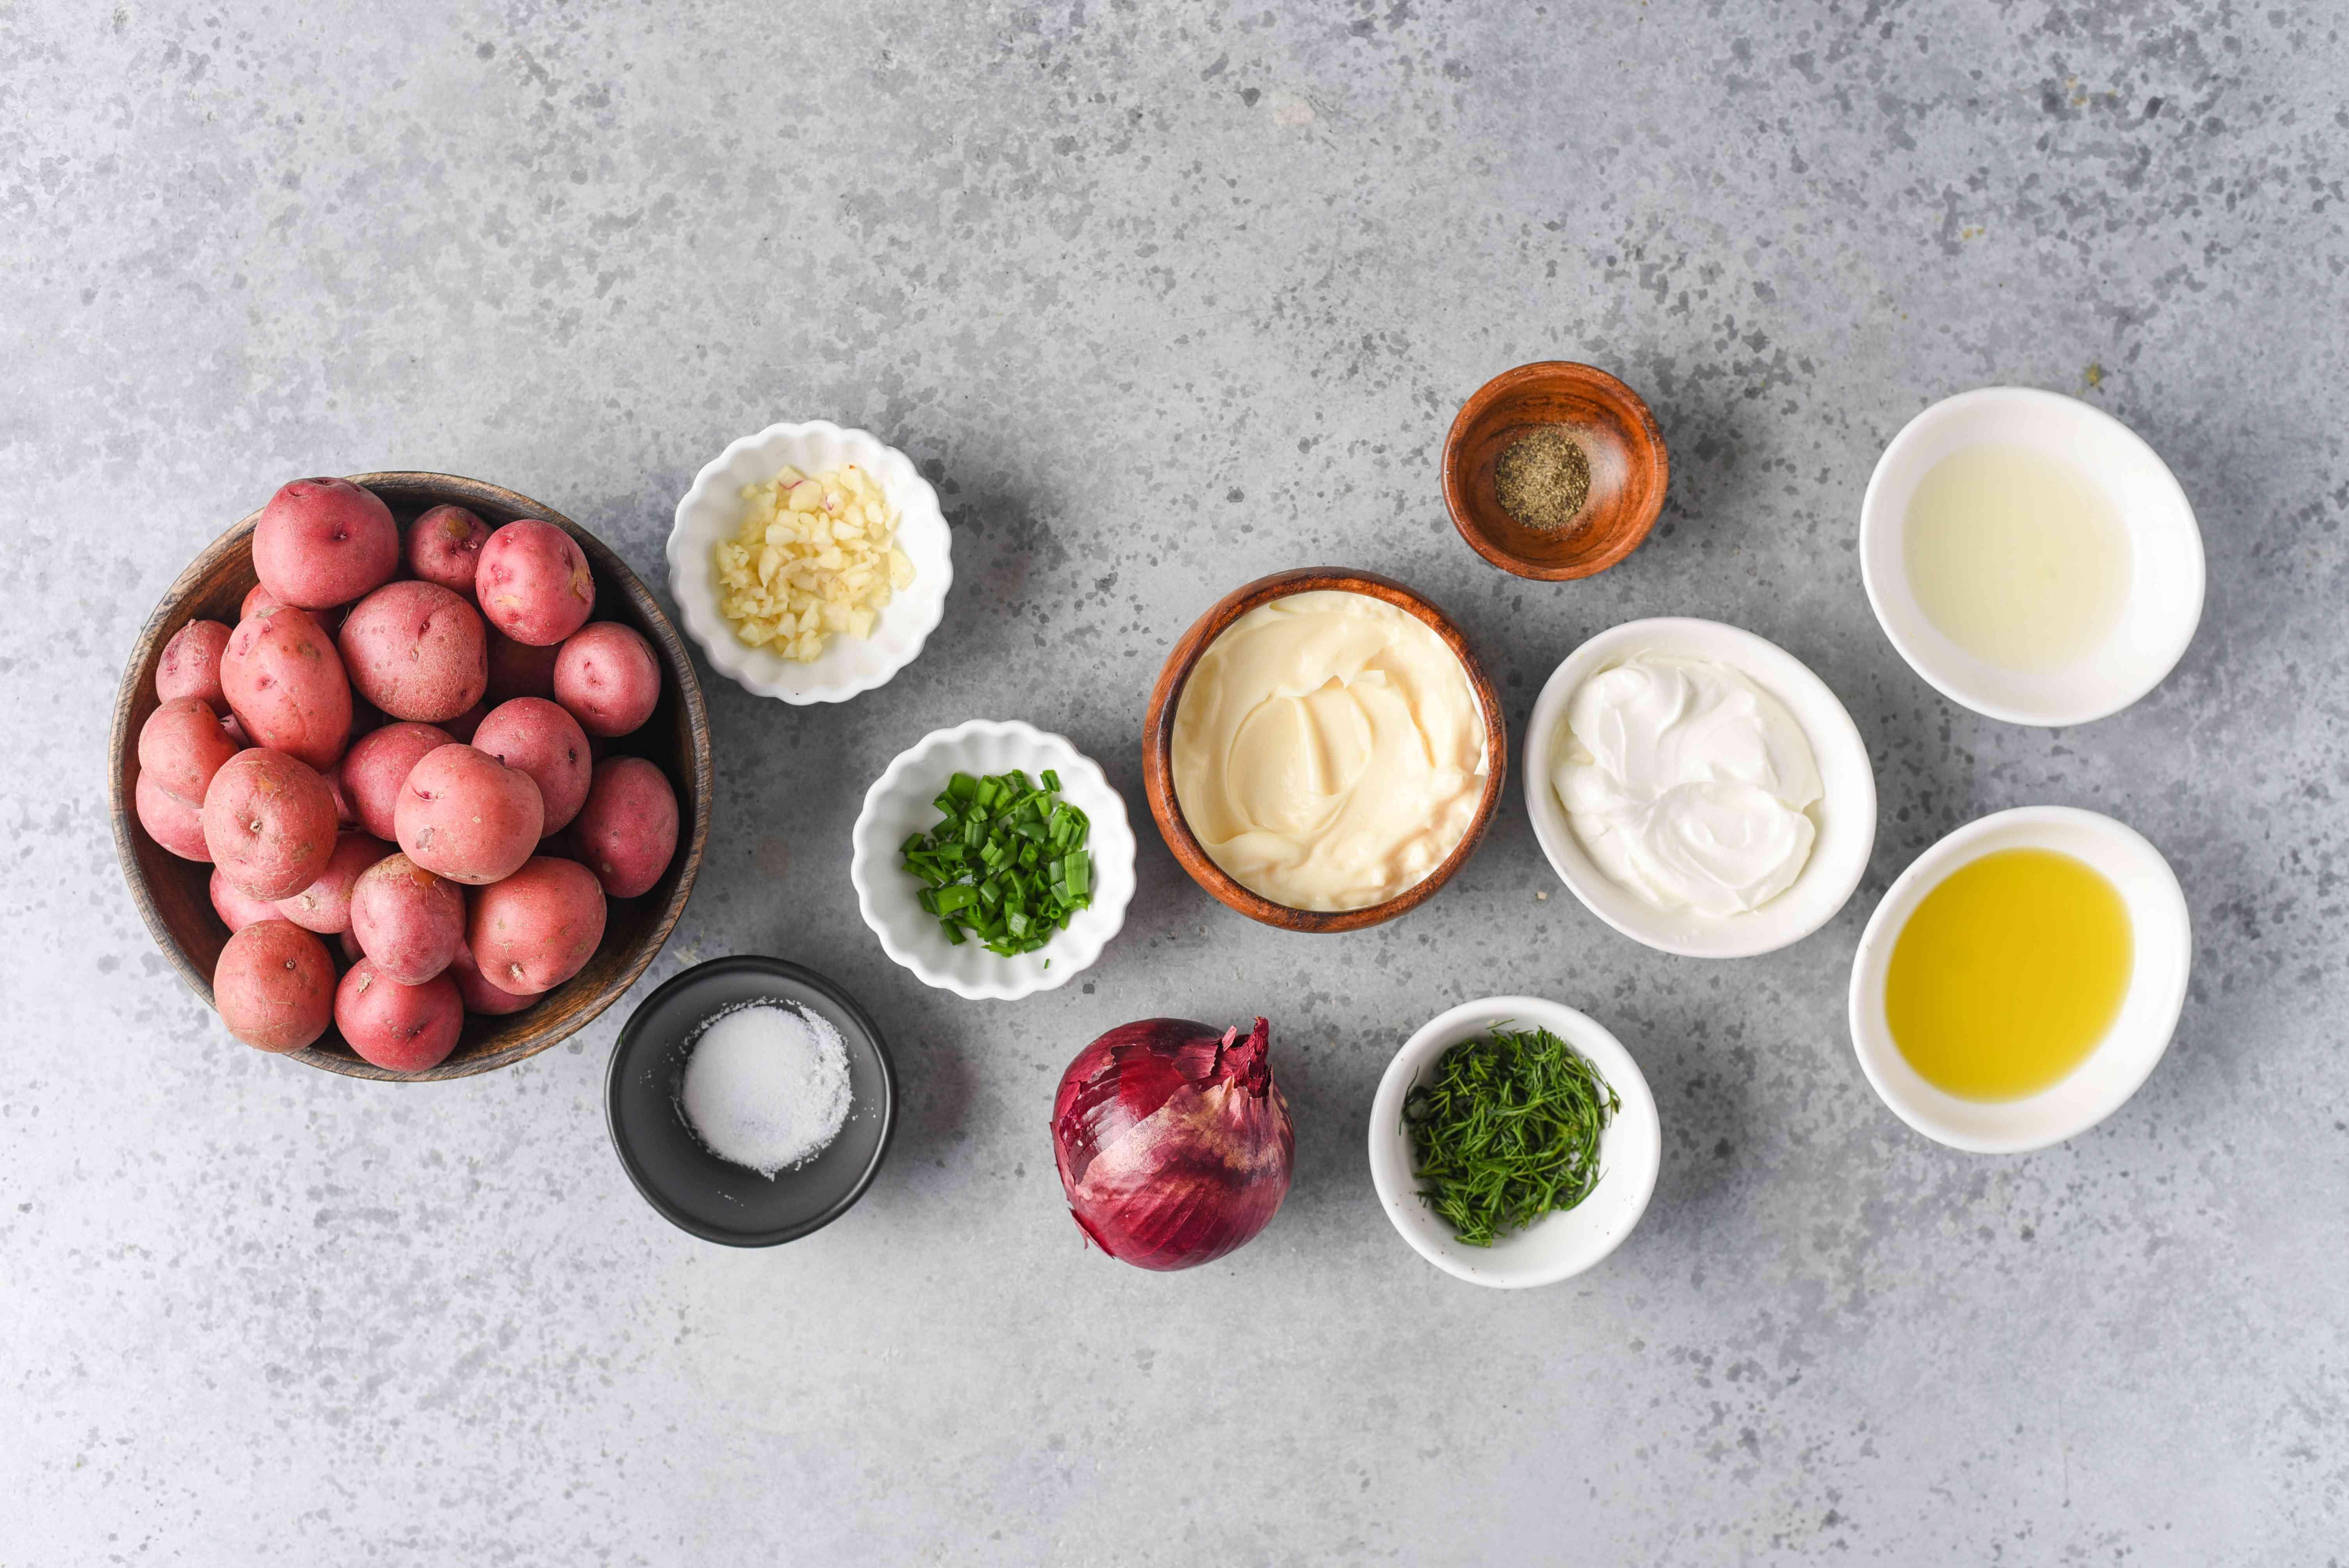 Roasted Potato Salad ingredients